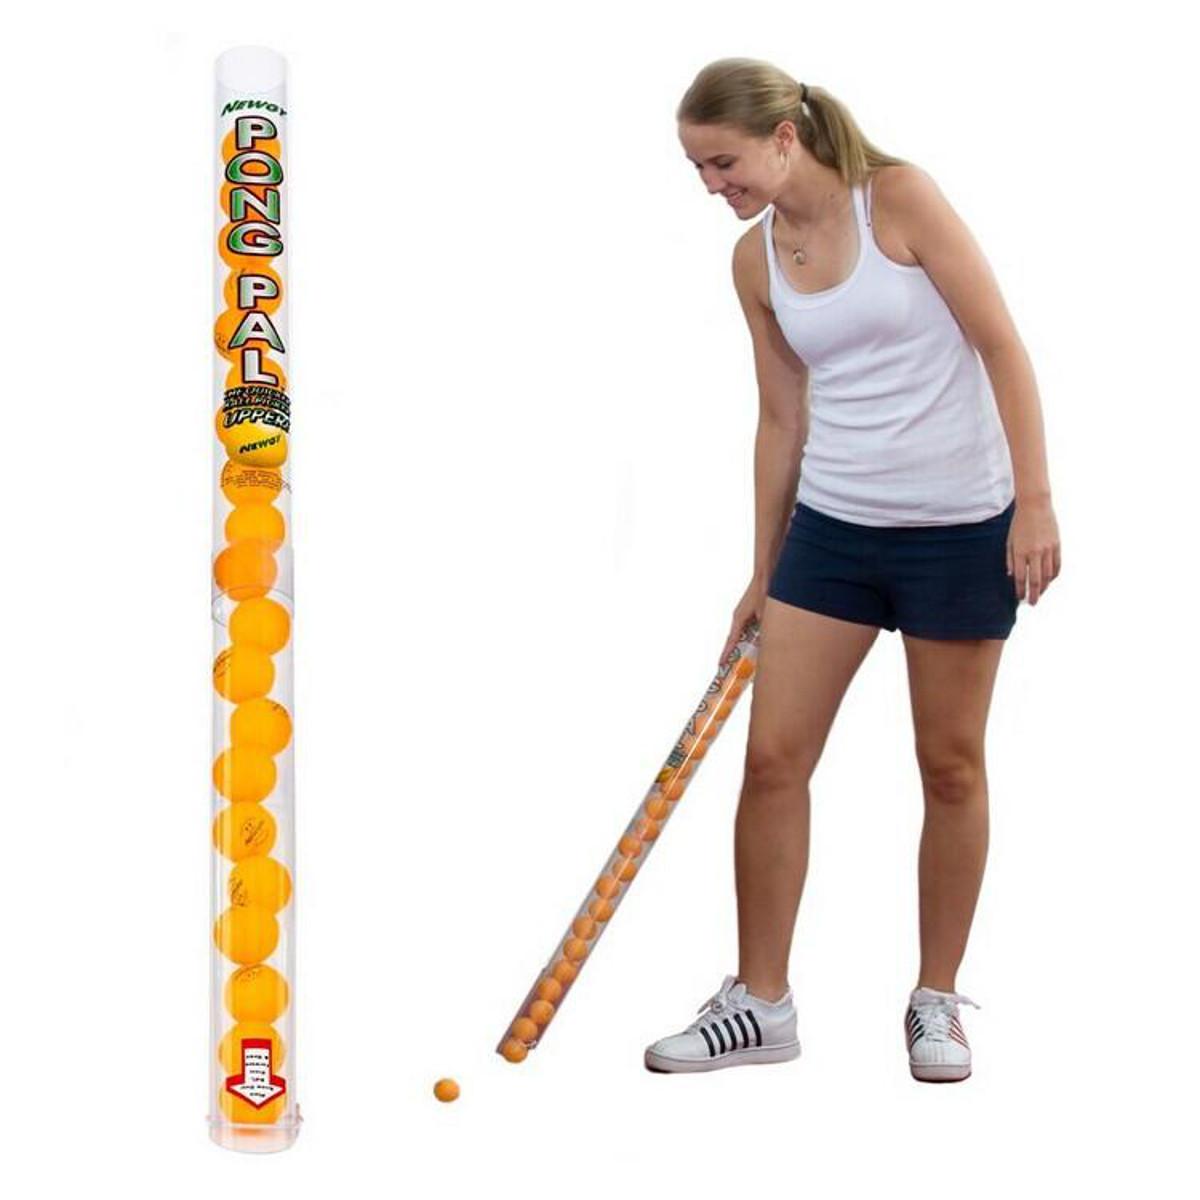 PickerBallдлянастольноготеннисадлиной 85 см Трубка Ping Pong Ball Picking Аксессуары для настольного тенниса - 1TopShop